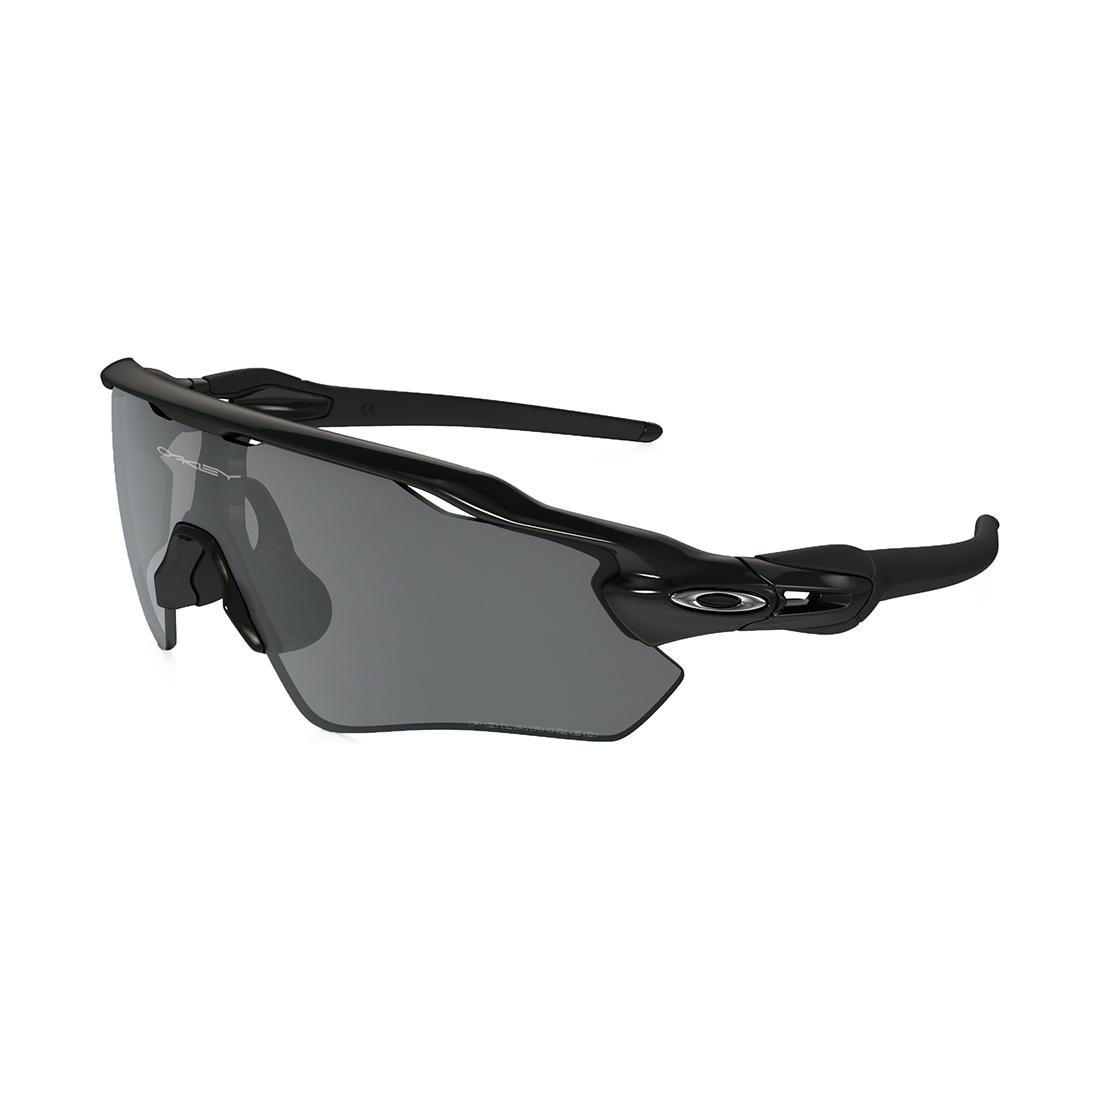 317b25df5d Sunglasses Oakley Hd Sunglasses High Definition « Heritage Malta